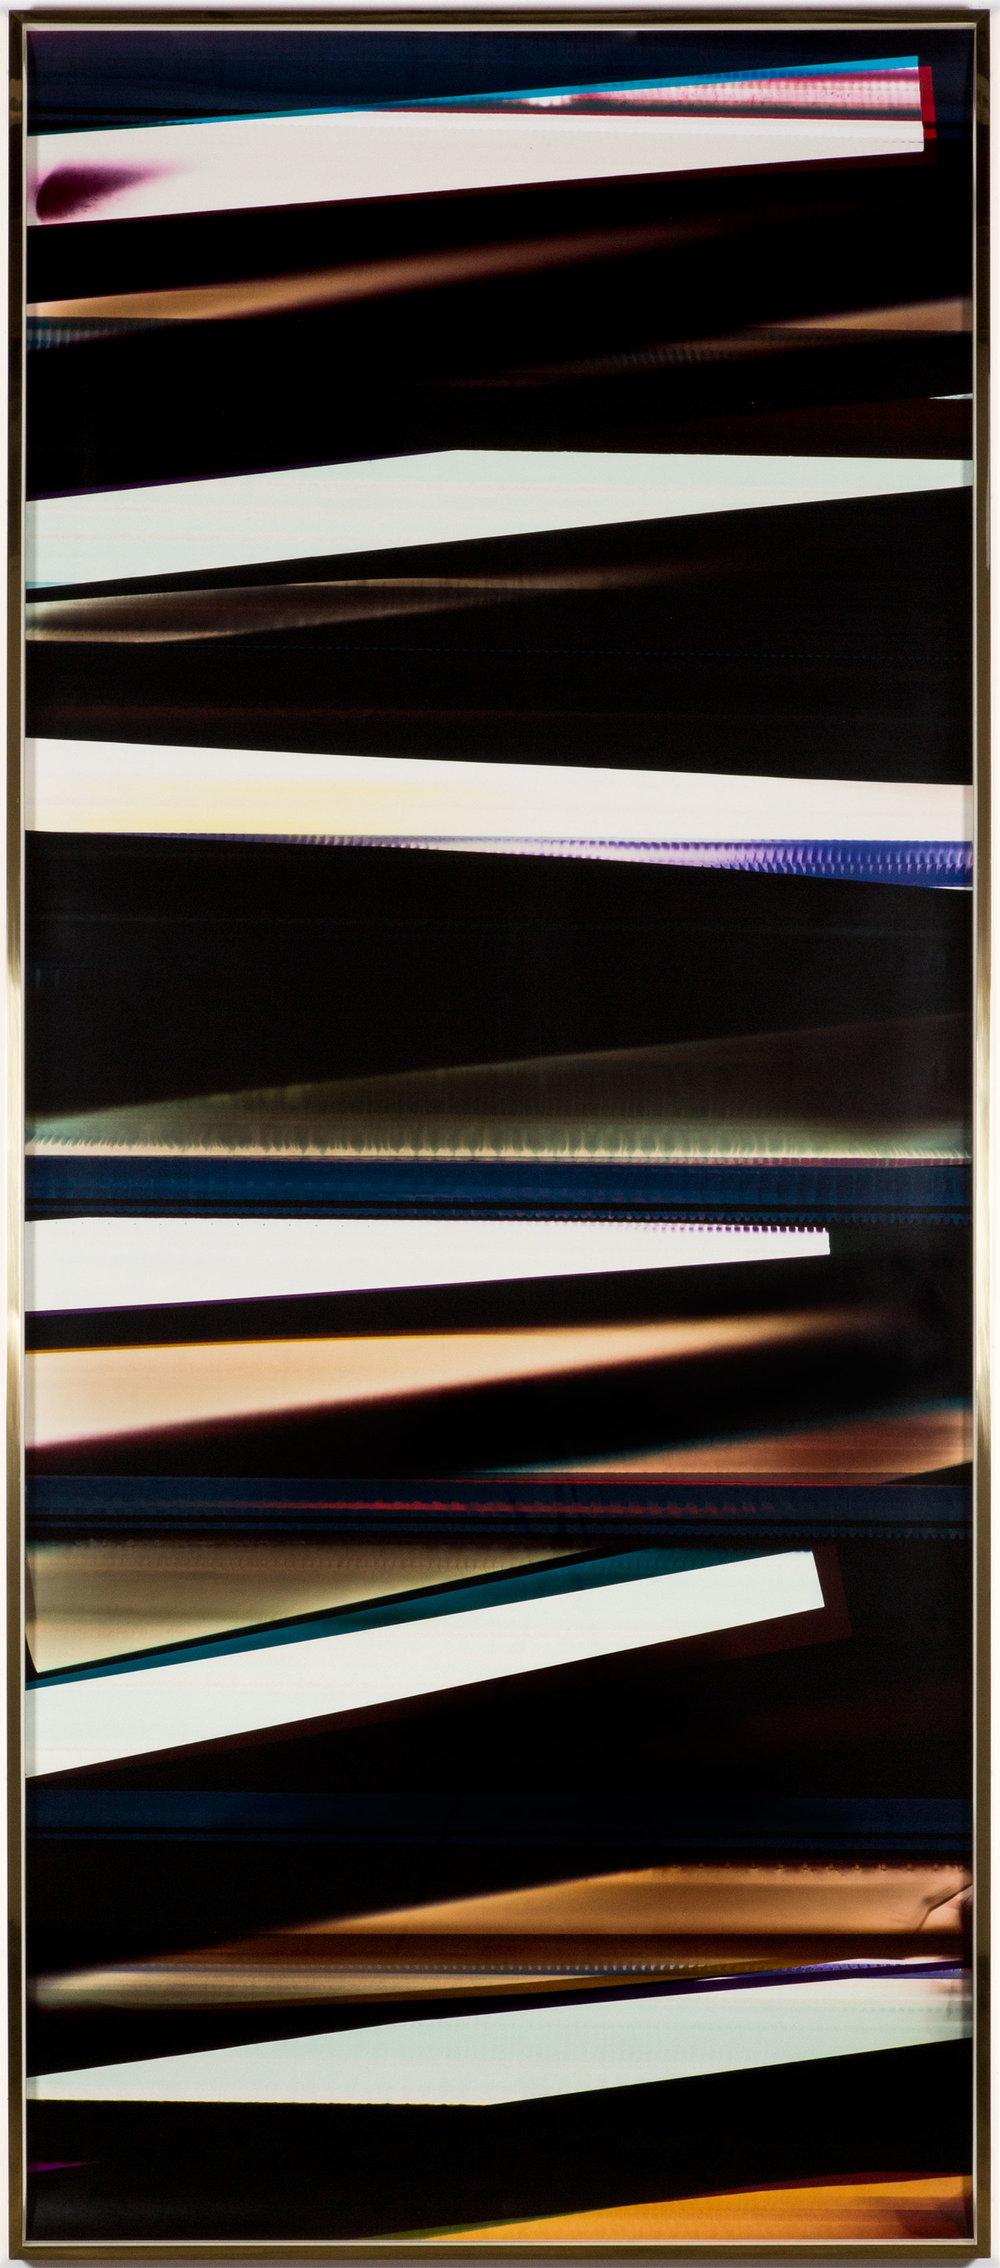 RA4 Contact Print / Processor Stall [Black Curl (9:6/MYC/Six Magnet: Los Angeles, California, July 15, 2014, Fuji Color Crystal Archive Super Type C, Em. No. 107-116, 75414), Kreonite KM IV 5225 RA4 Color Processor, Ser. No. 00092174]    2016   Color photographic paper  119 3/4 x 51 1/2 inches   Automat, 2016